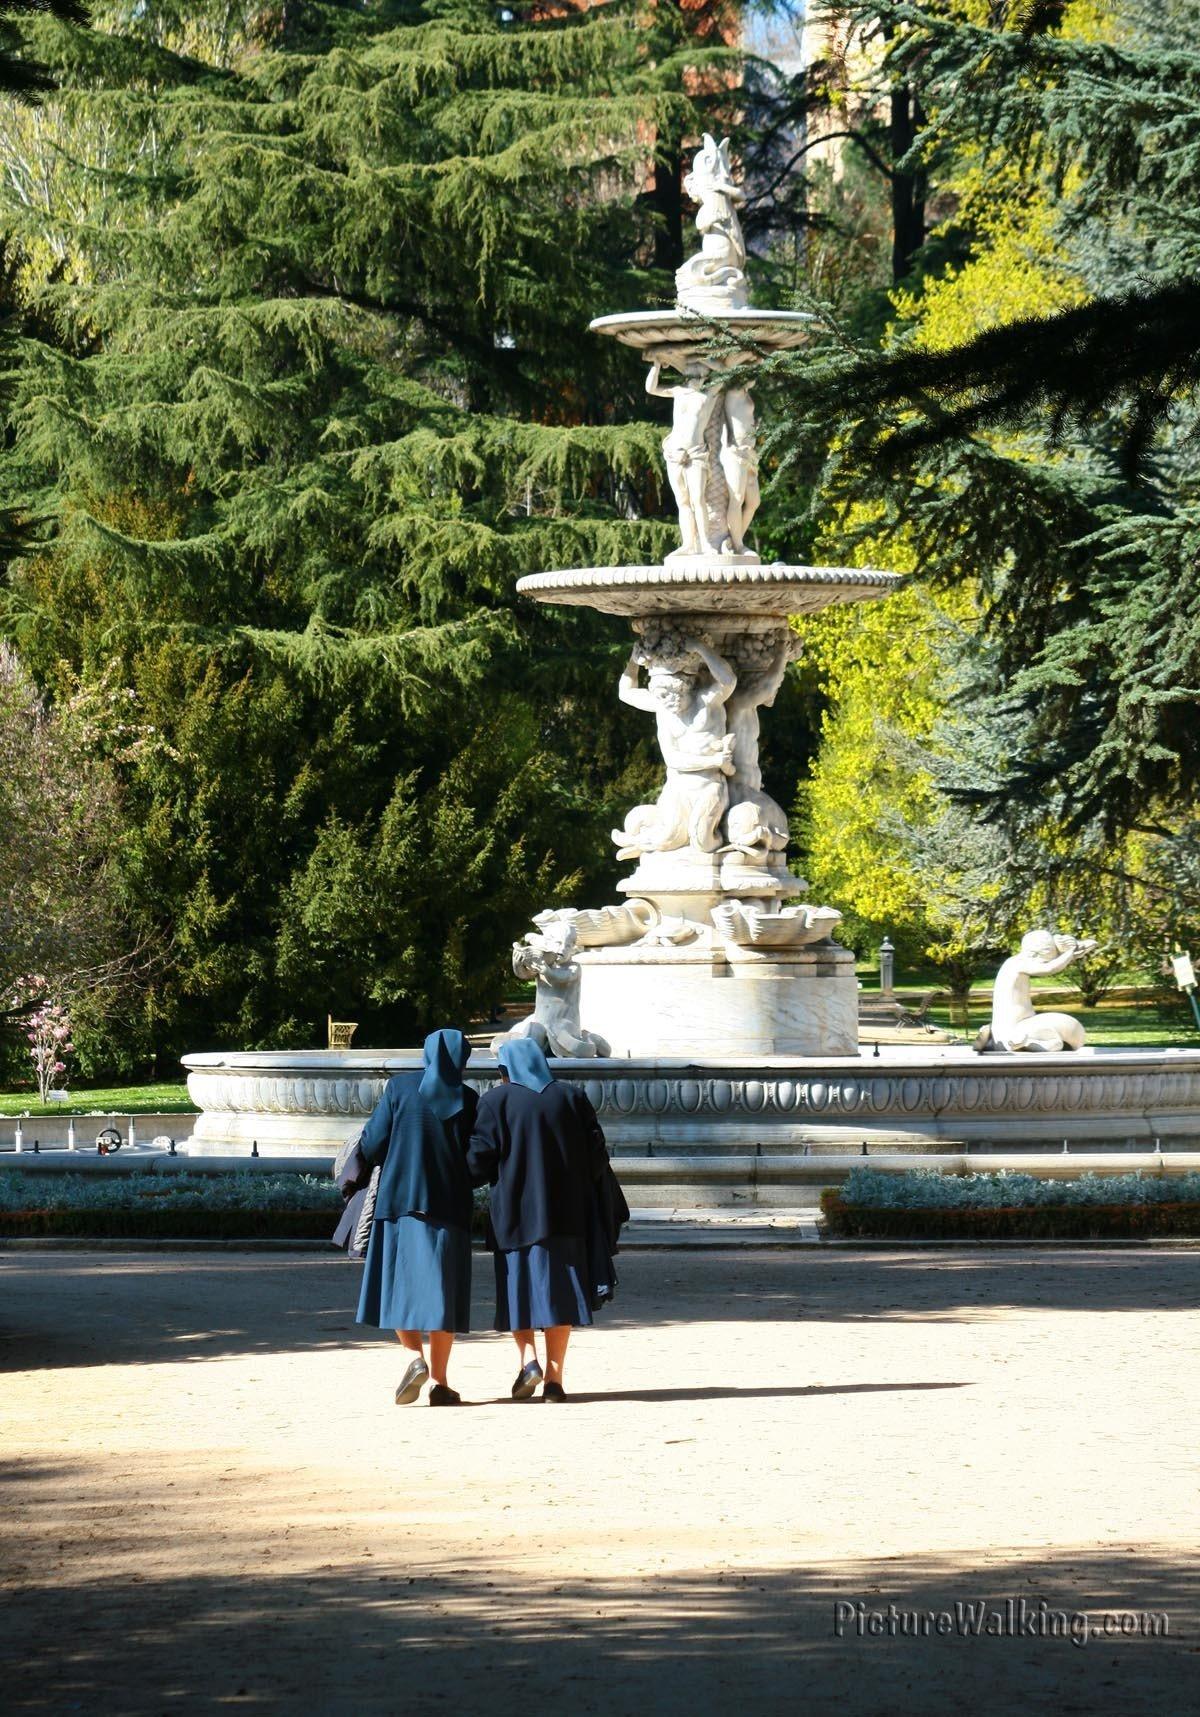 Campo del Moro de Madrid